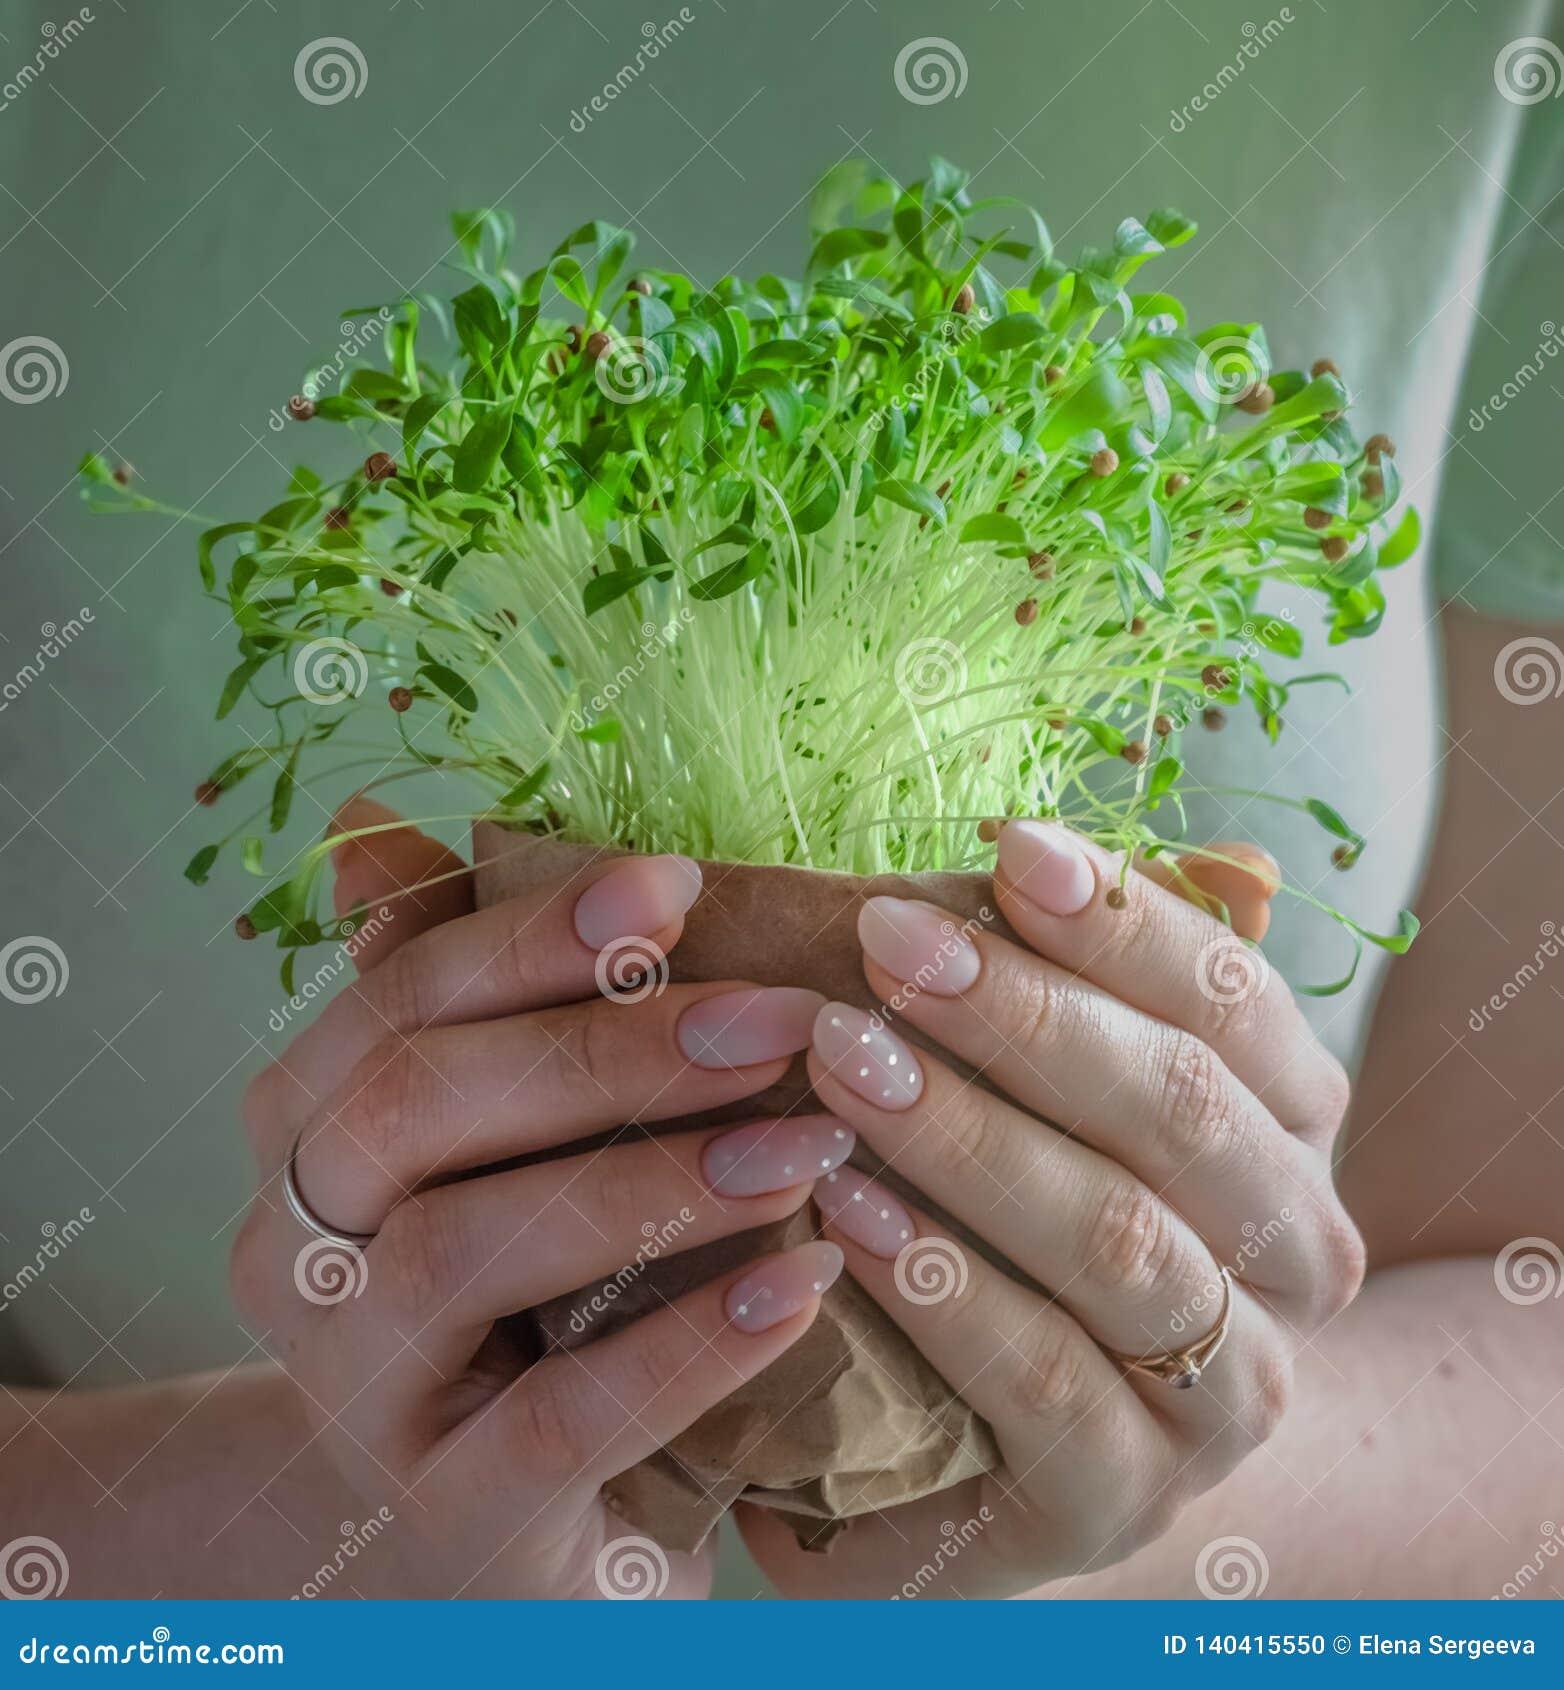 Green plant new spouts eco